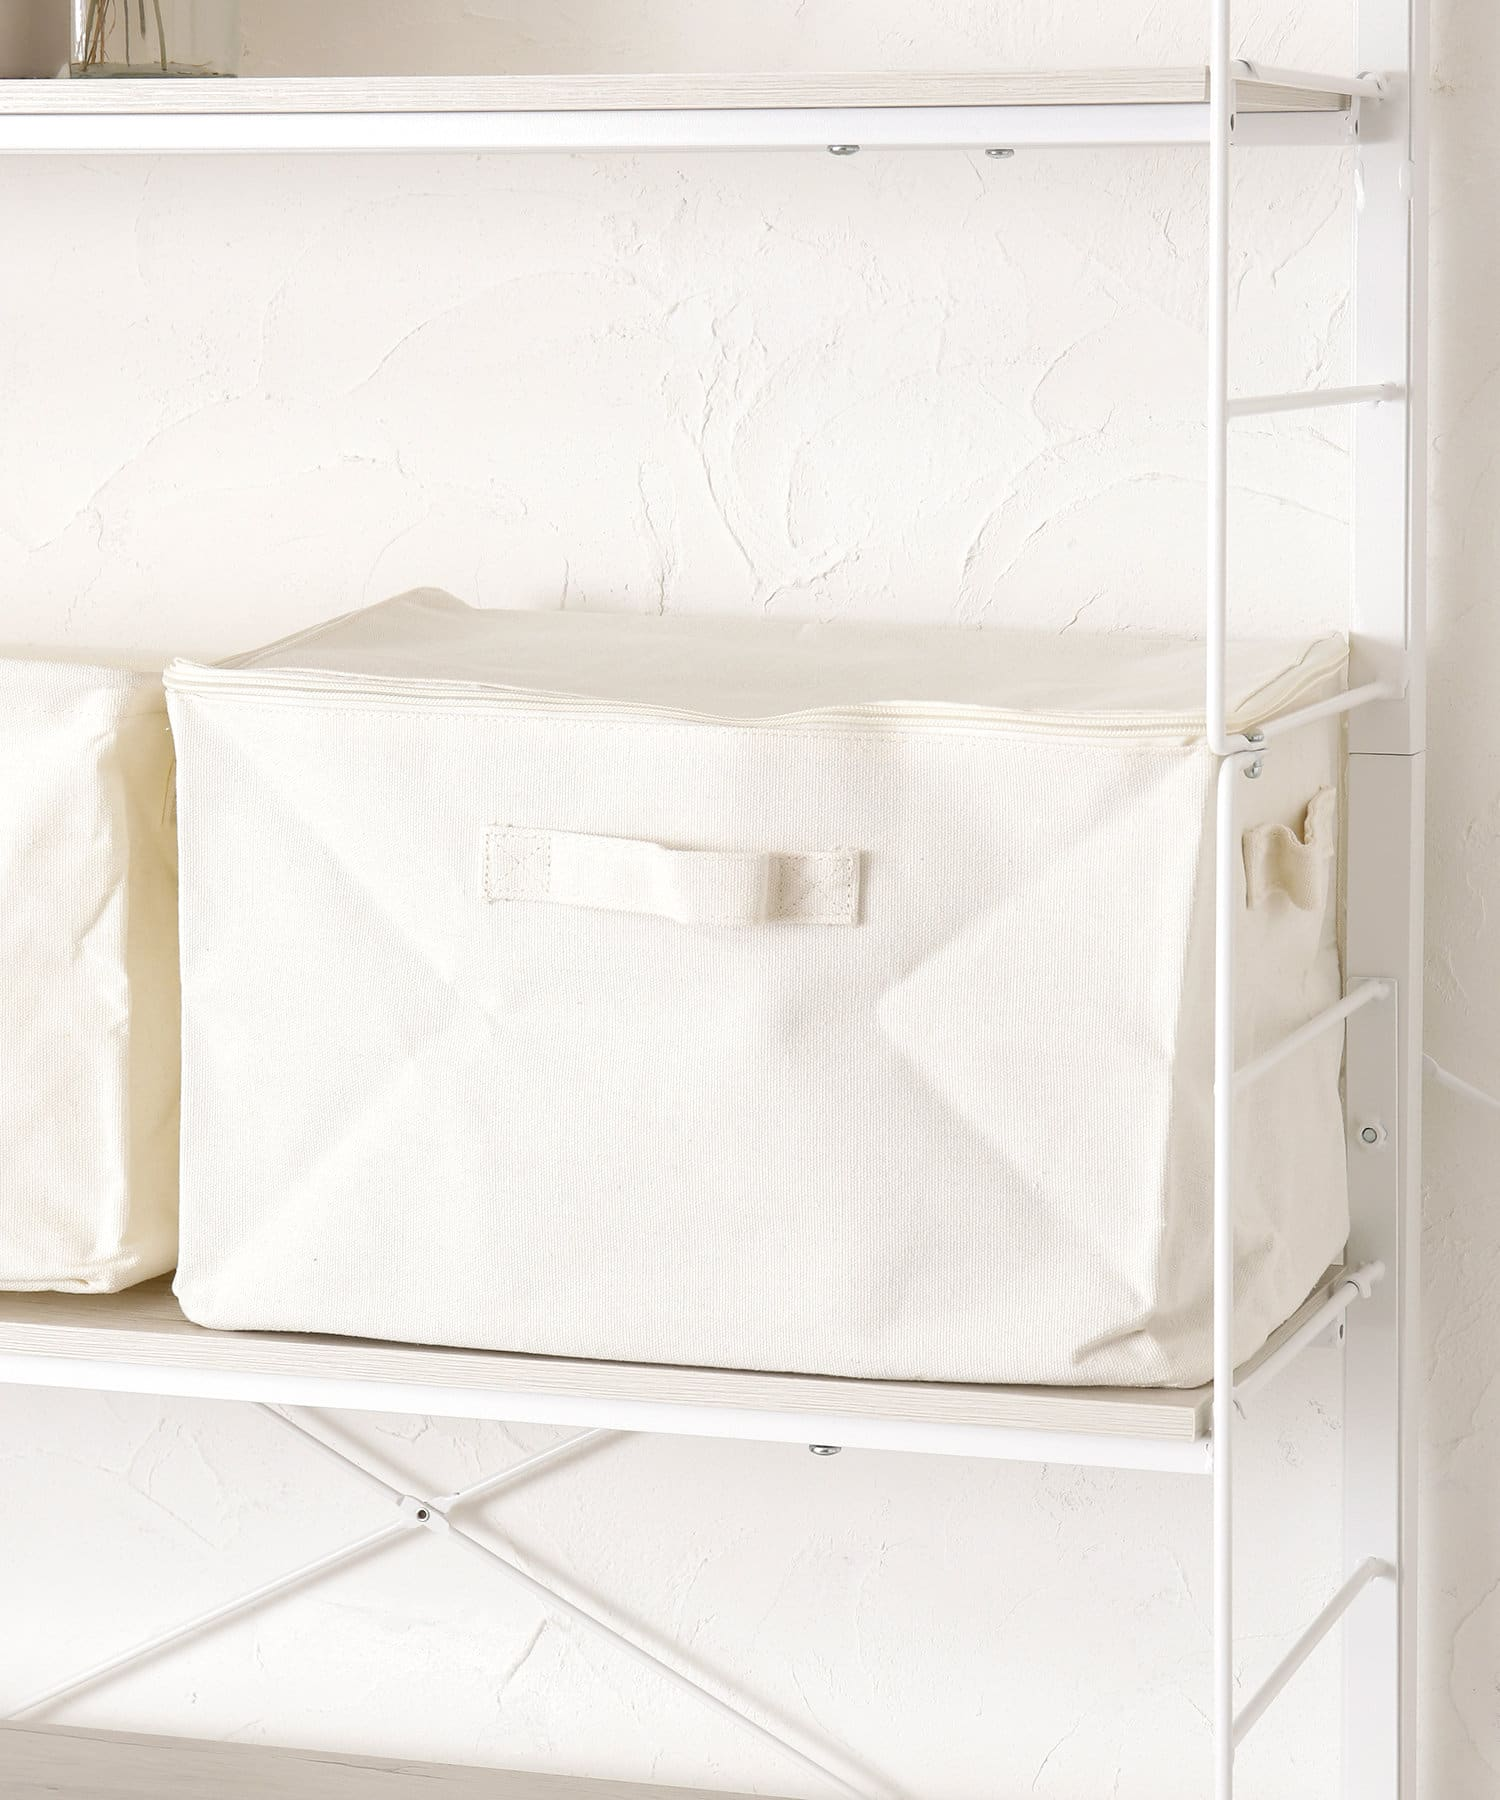 3COINS(スリーコインズ) ライフスタイル コットンフタ付ワイド収納ボックス アイボリー